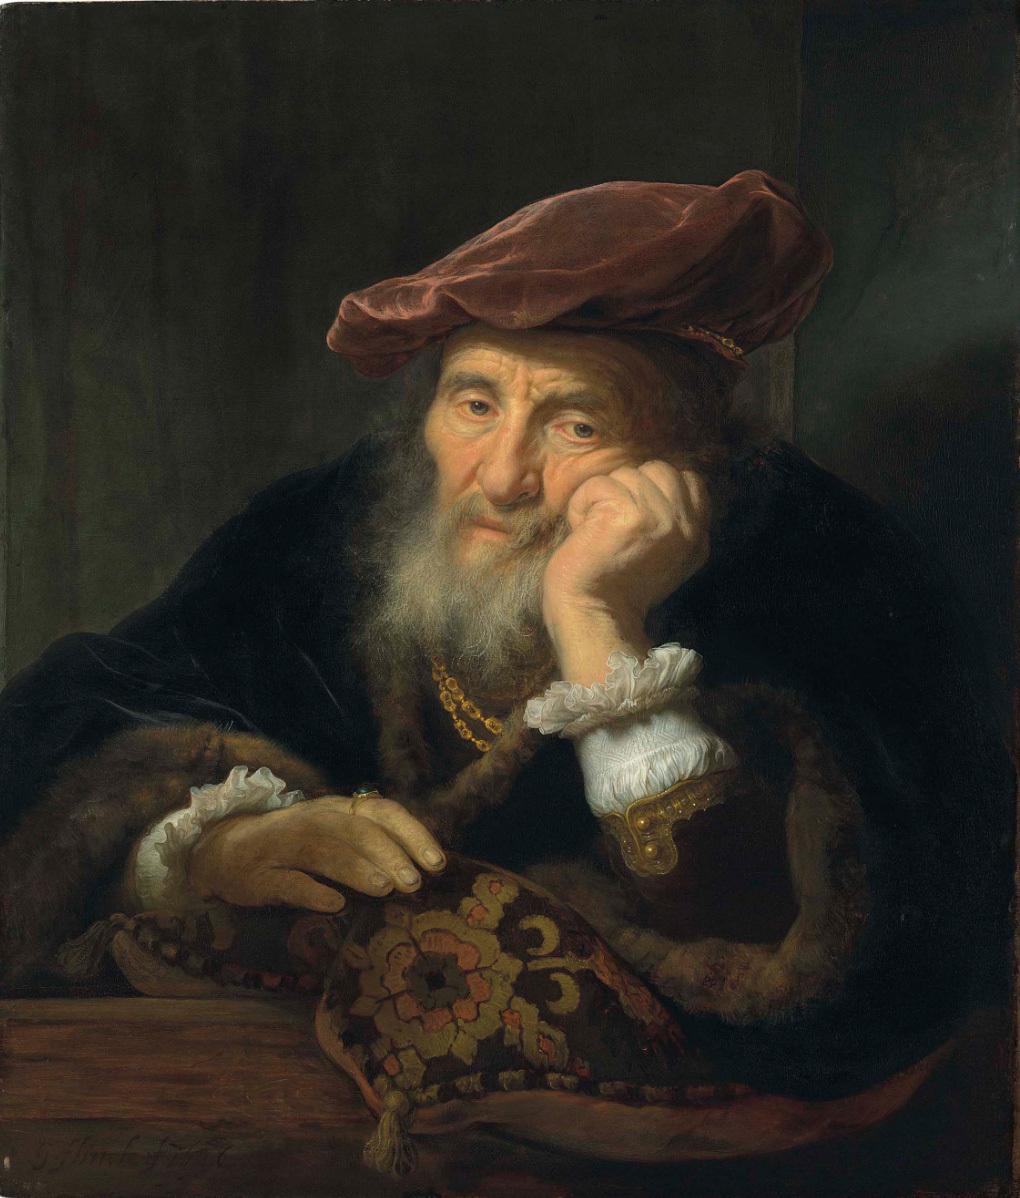 Govaert Flinck, Alter Mann an der Fensterbank   Foto: Christie's